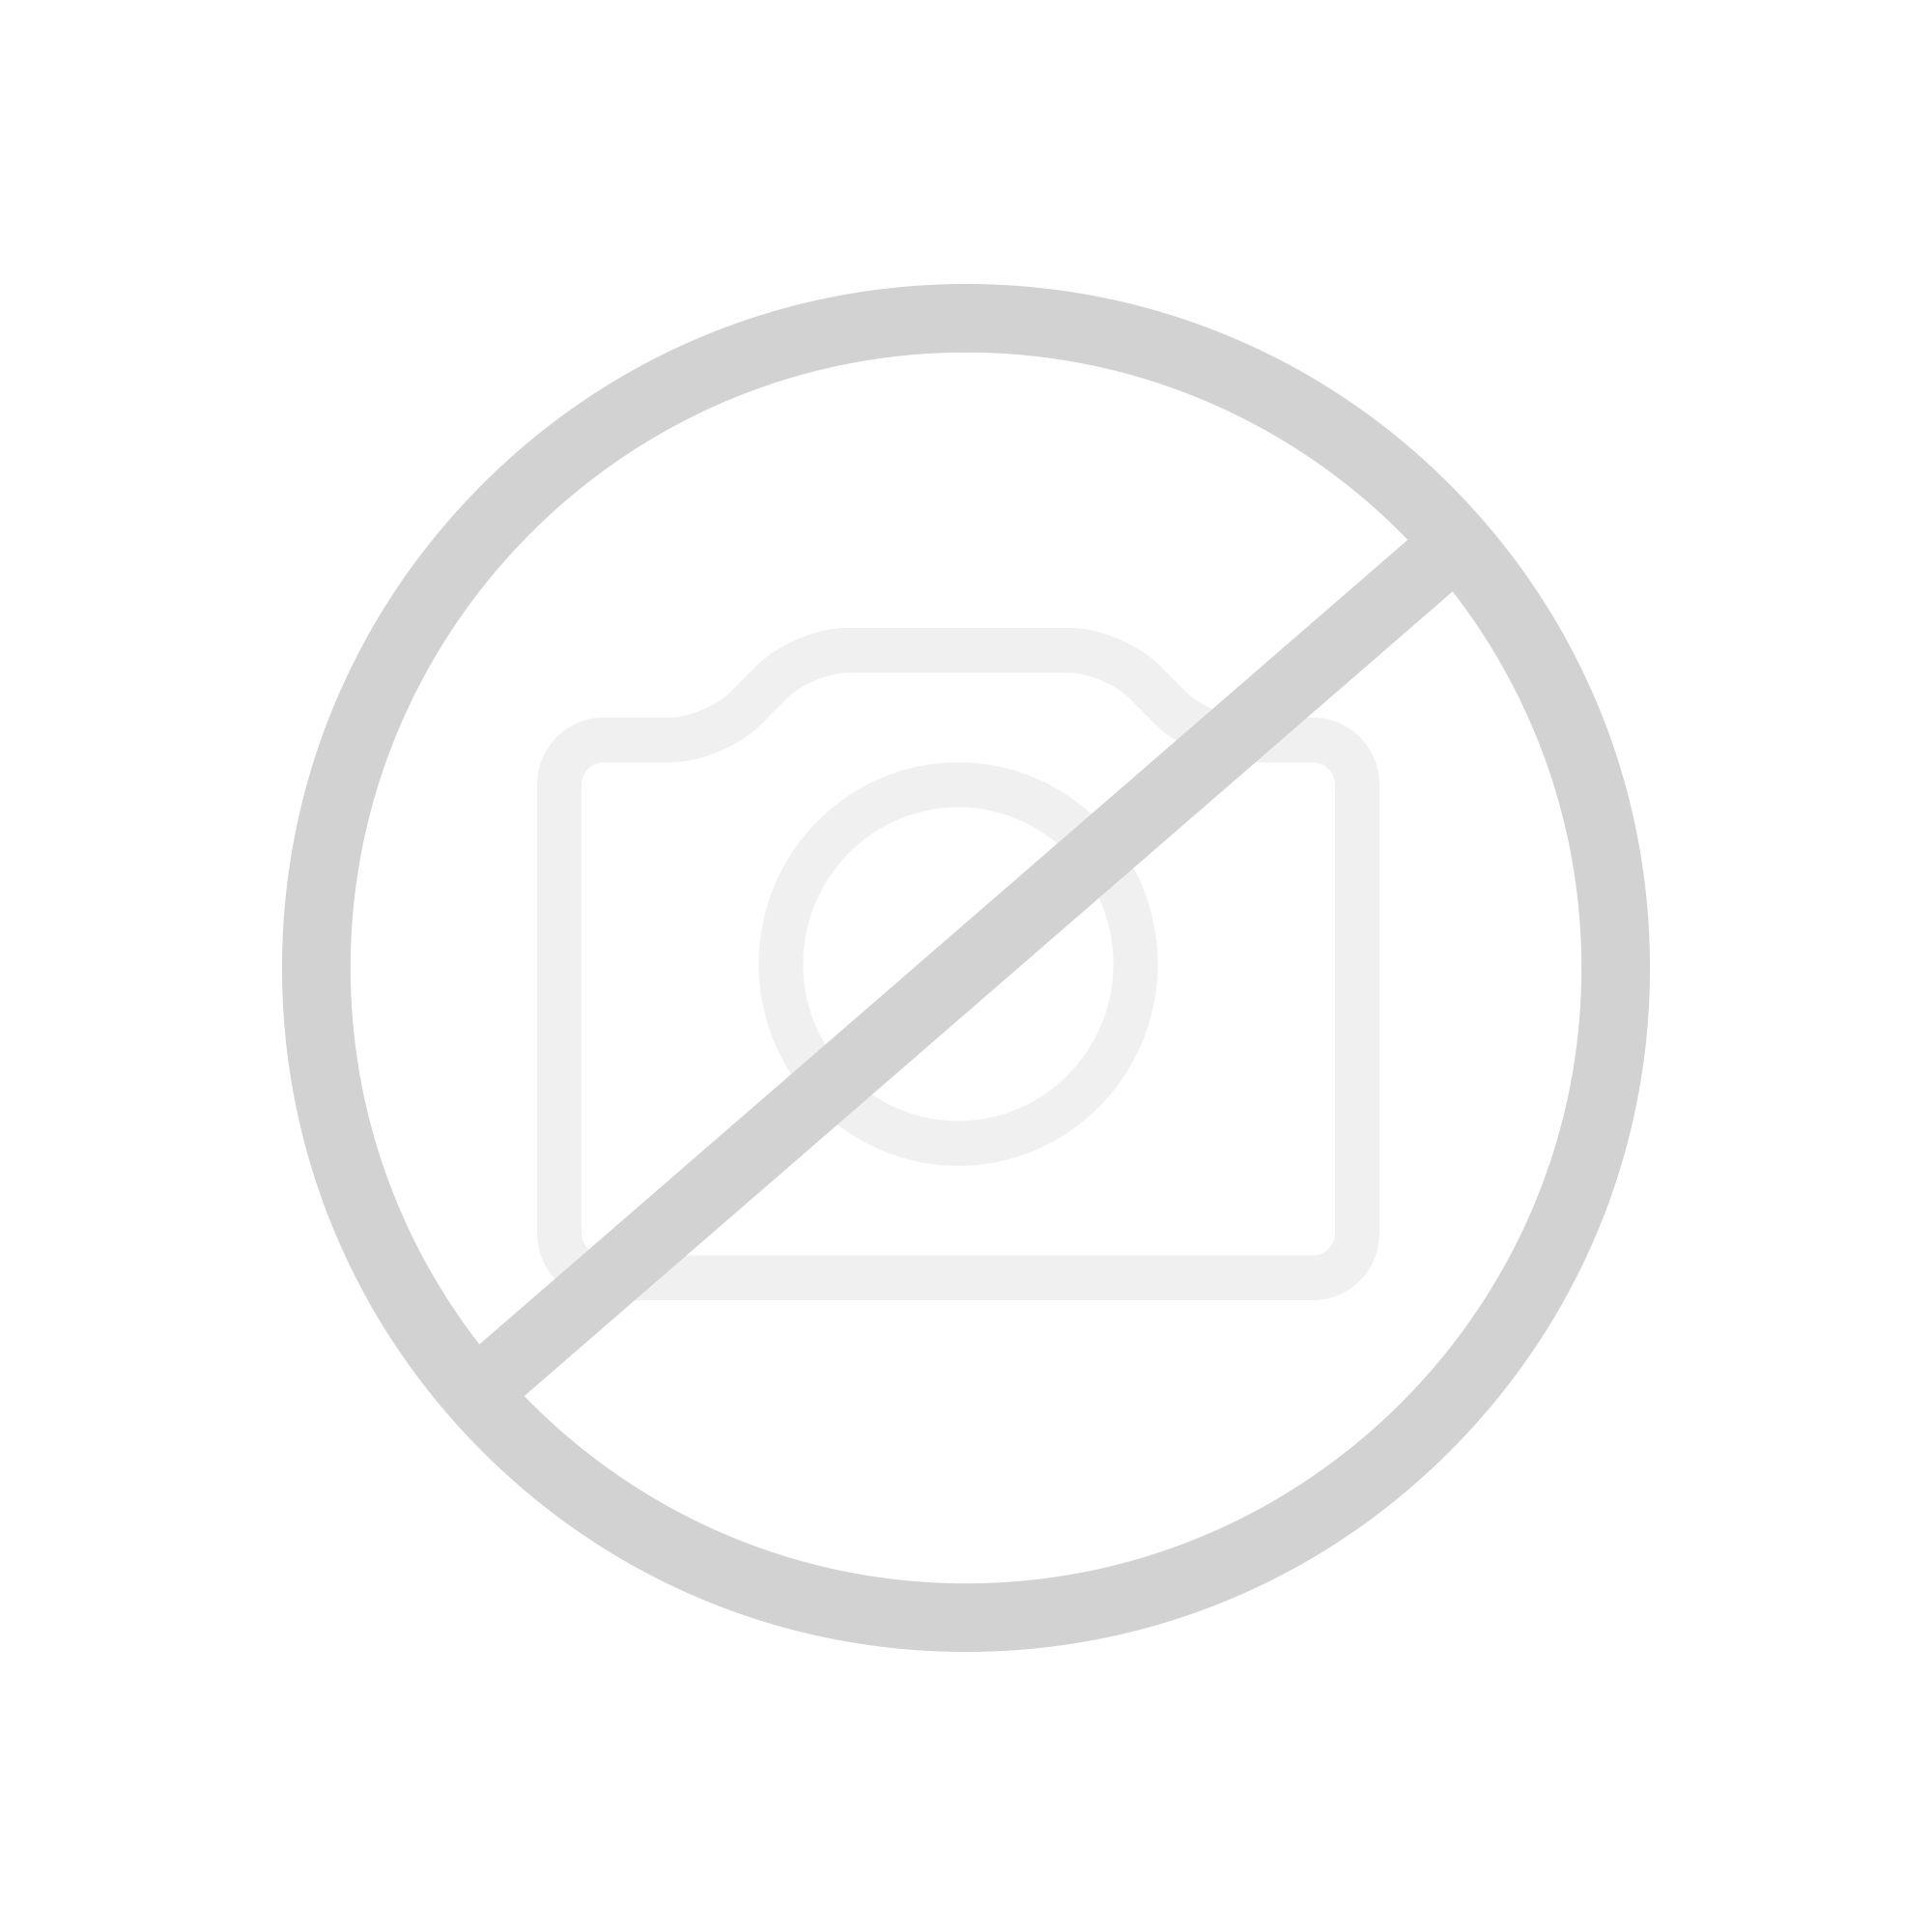 antoniolupi PLAY54 Handtuchstange